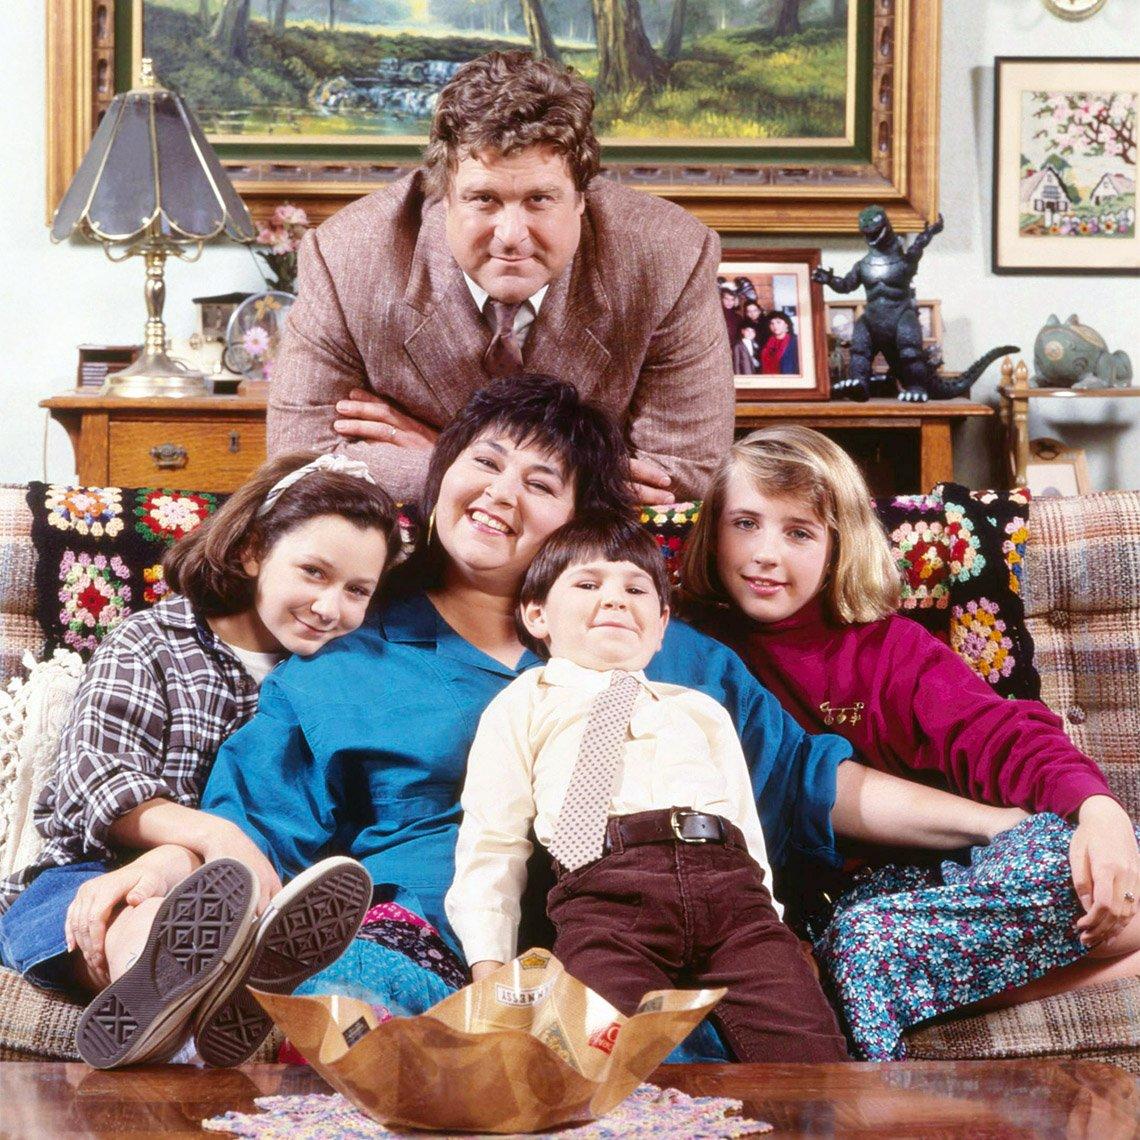 Original cast of Roseanne